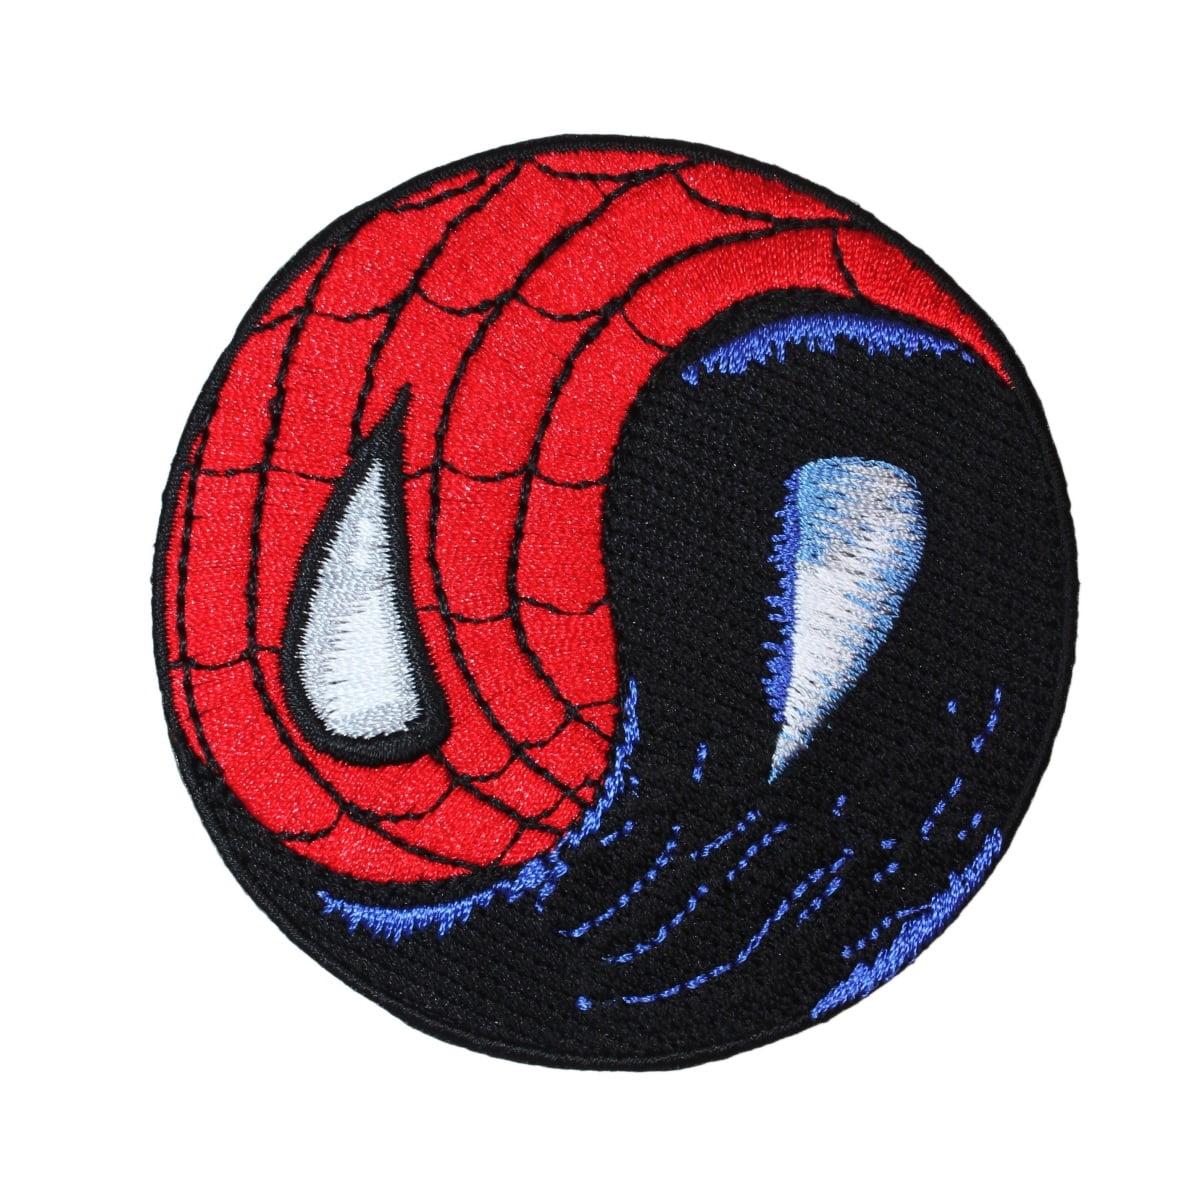 Spider-Man vs Venom Symbiote Yin-Yang Patch Superhero Comic Fan Iron-On Applique